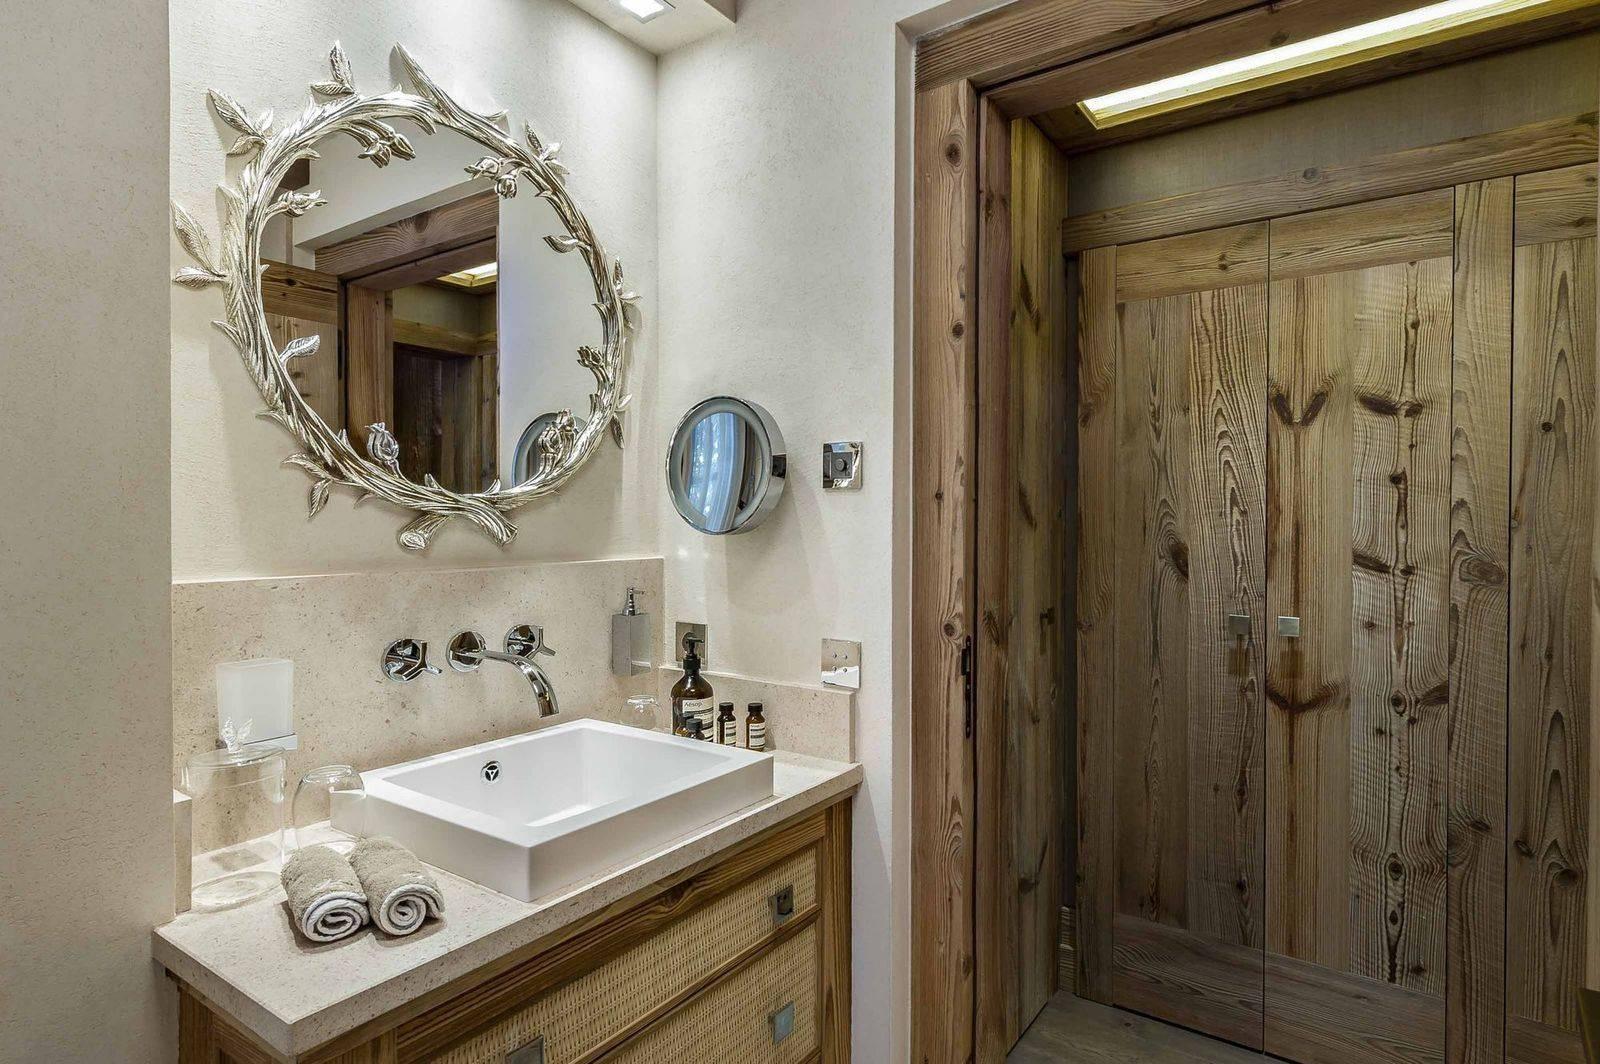 Courchevel 1850 Luxury Rental Chalet Chursinite Bathroom